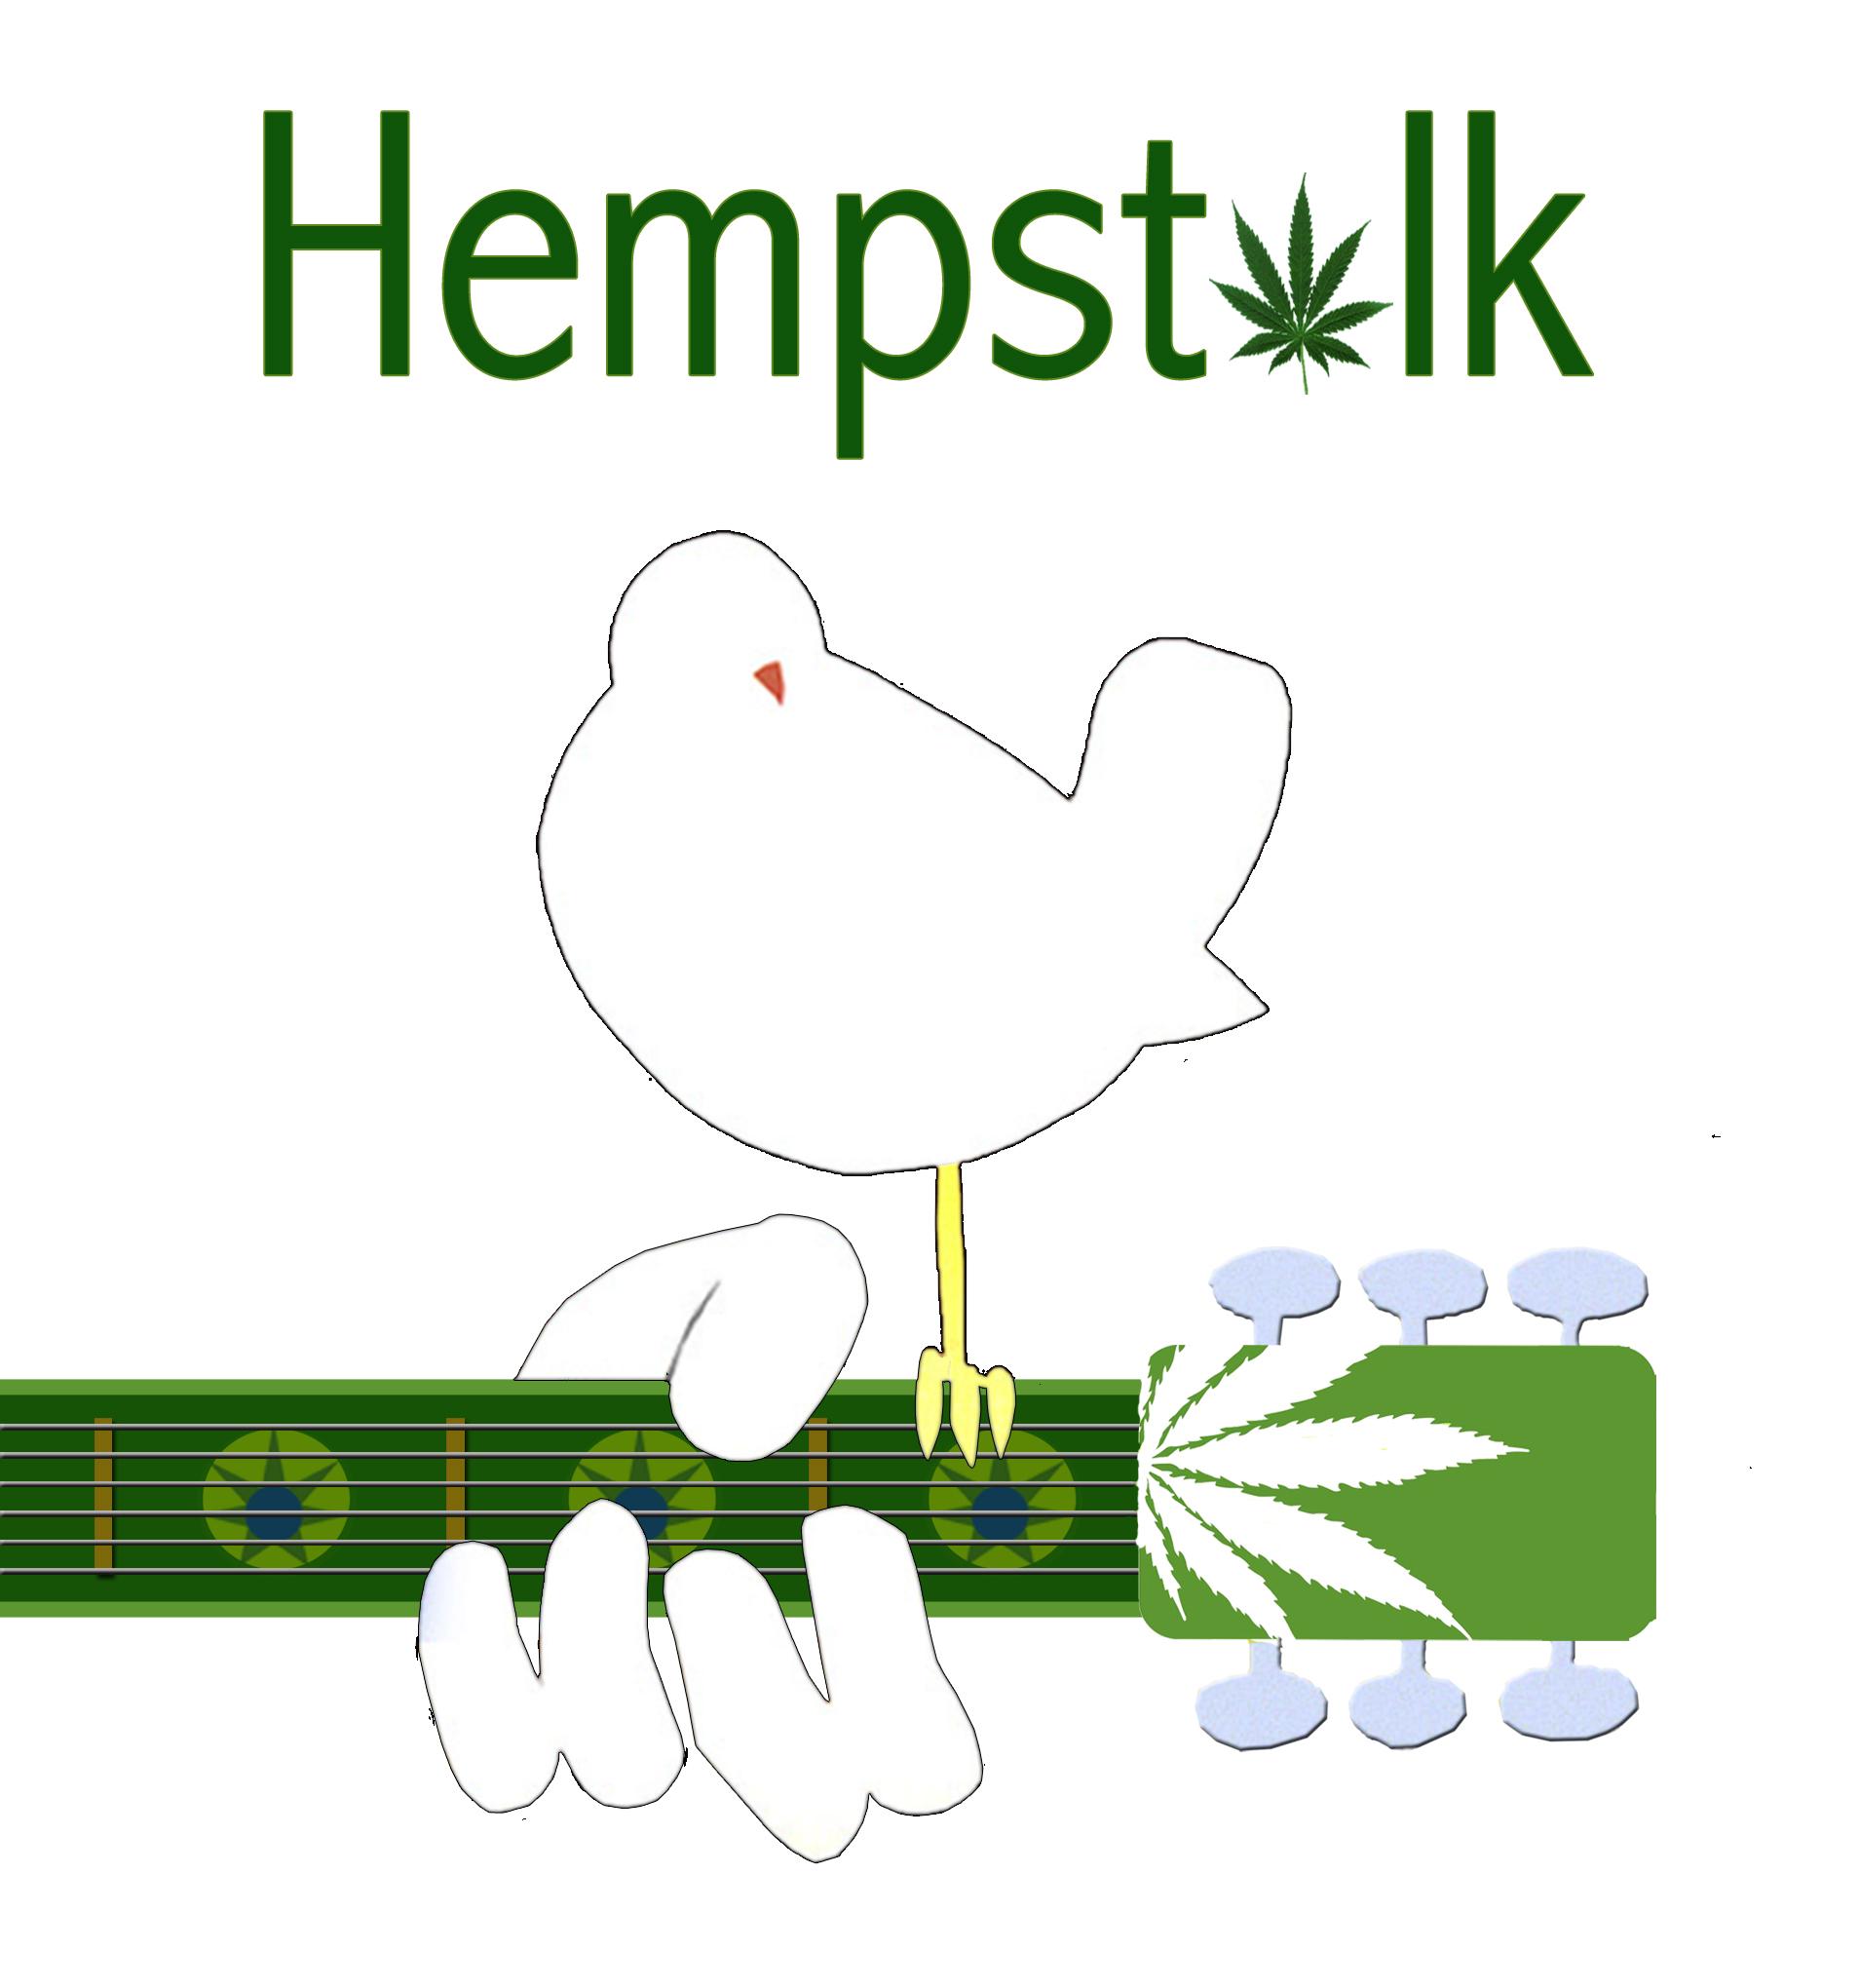 hempstalk_2015.jpg